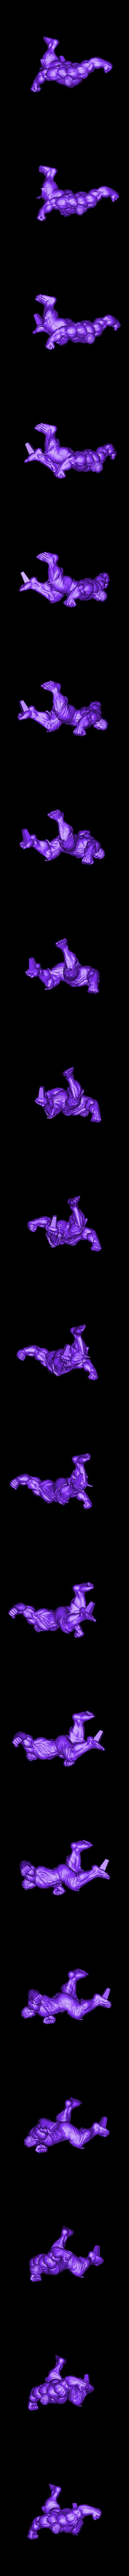 Hulk_Full_300mm.stl Download STL file Hulk Angry - Super Hero - Marvel 3D print model • 3D print model, Bstar3Dart